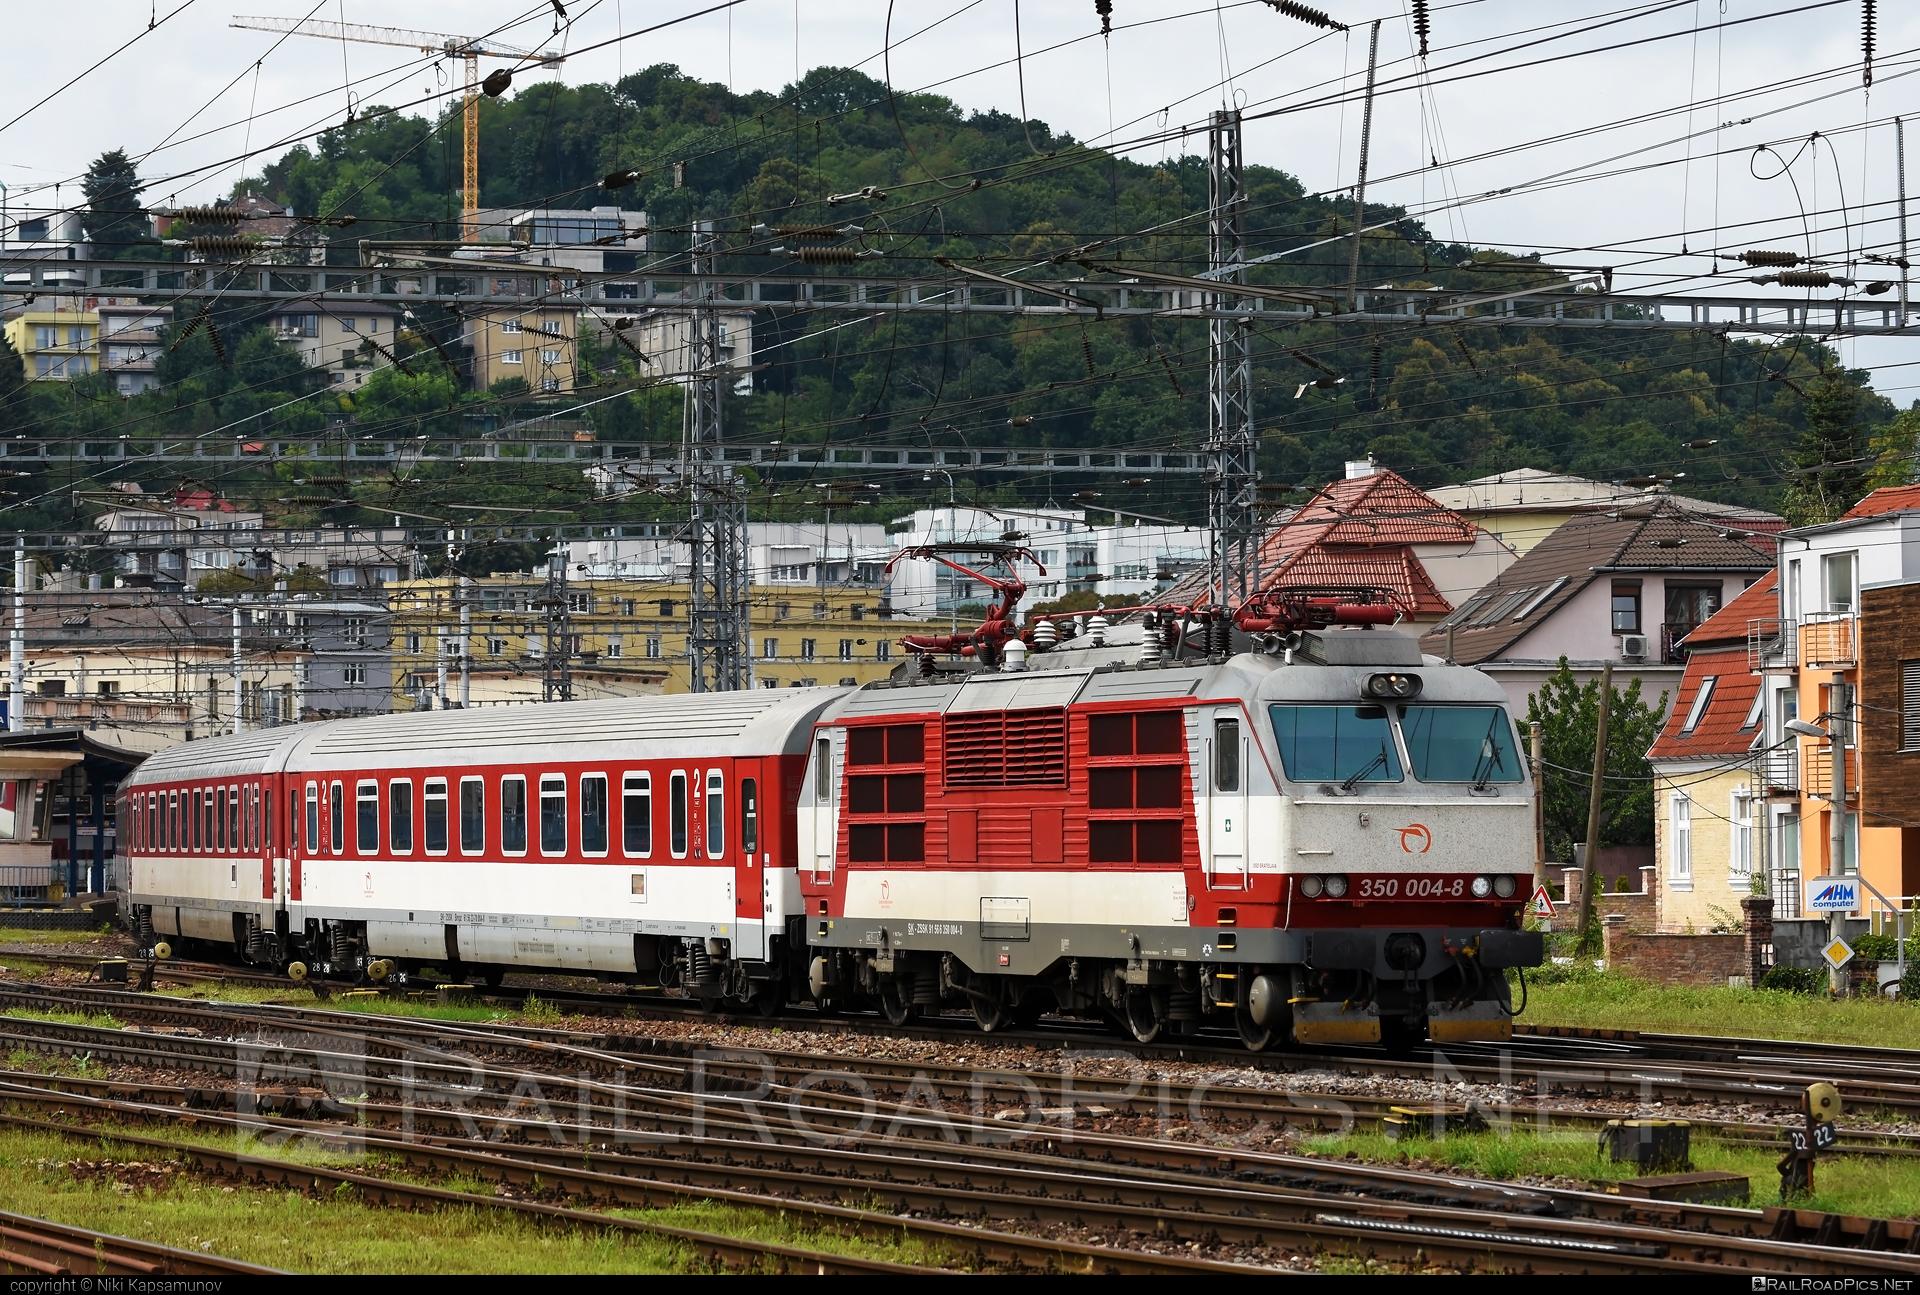 Škoda 55E - 350 004-8 operated by Železničná Spoločnost' Slovensko, a.s. #ZeleznicnaSpolocnostSlovensko #gorila #locomotive350 #skoda #skoda55e #zssk